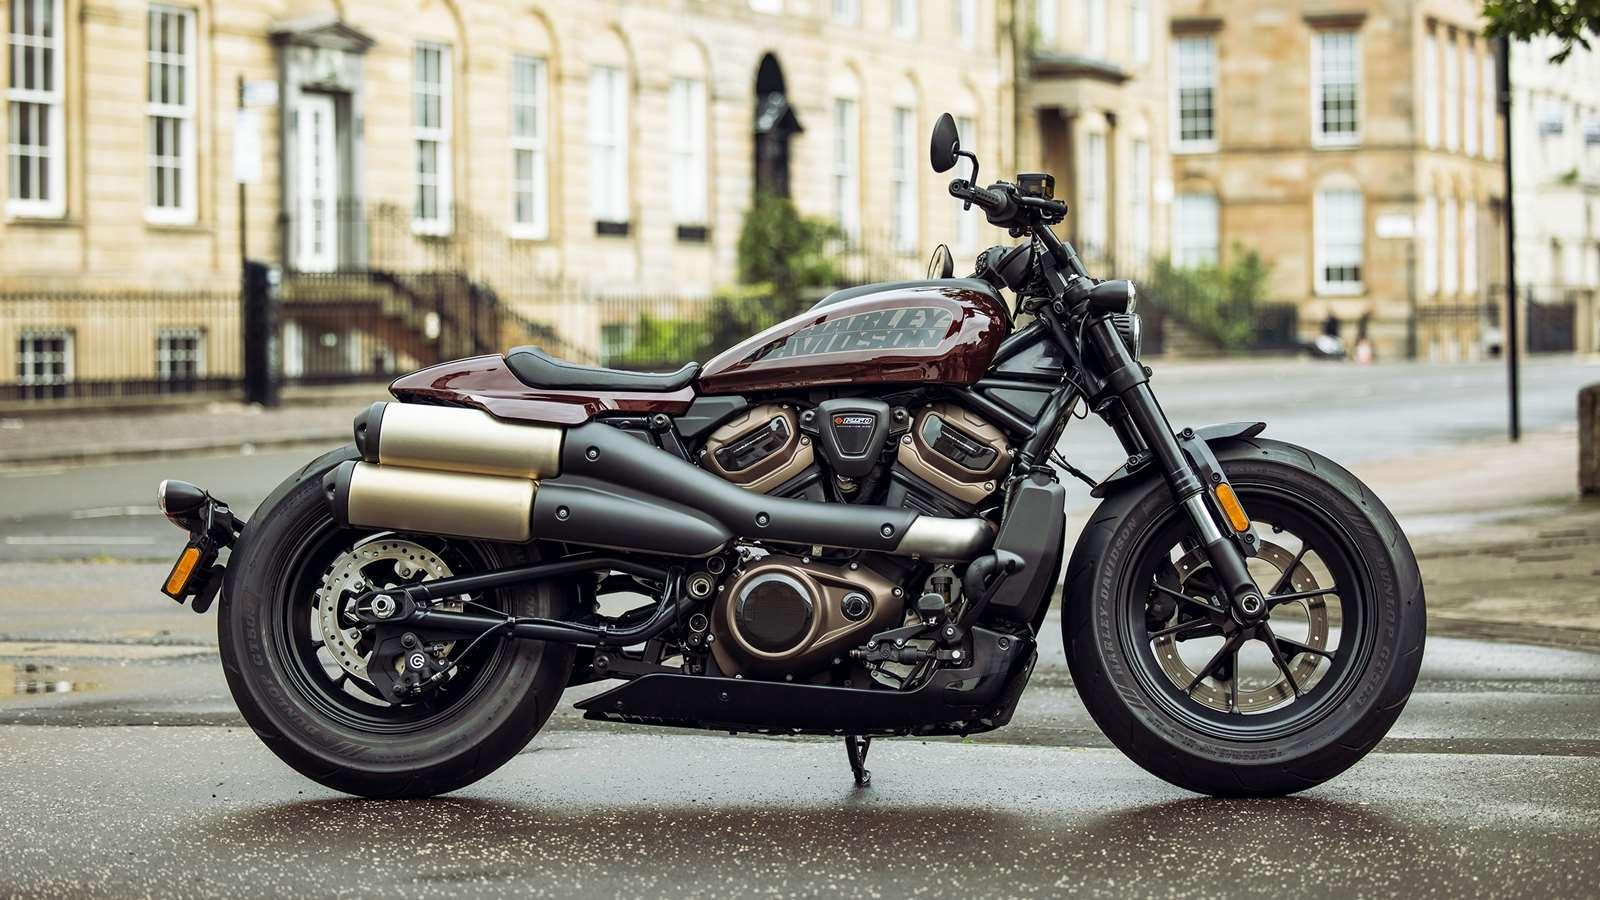 Harley‑davidson Reveals Revolutionary Sportster S